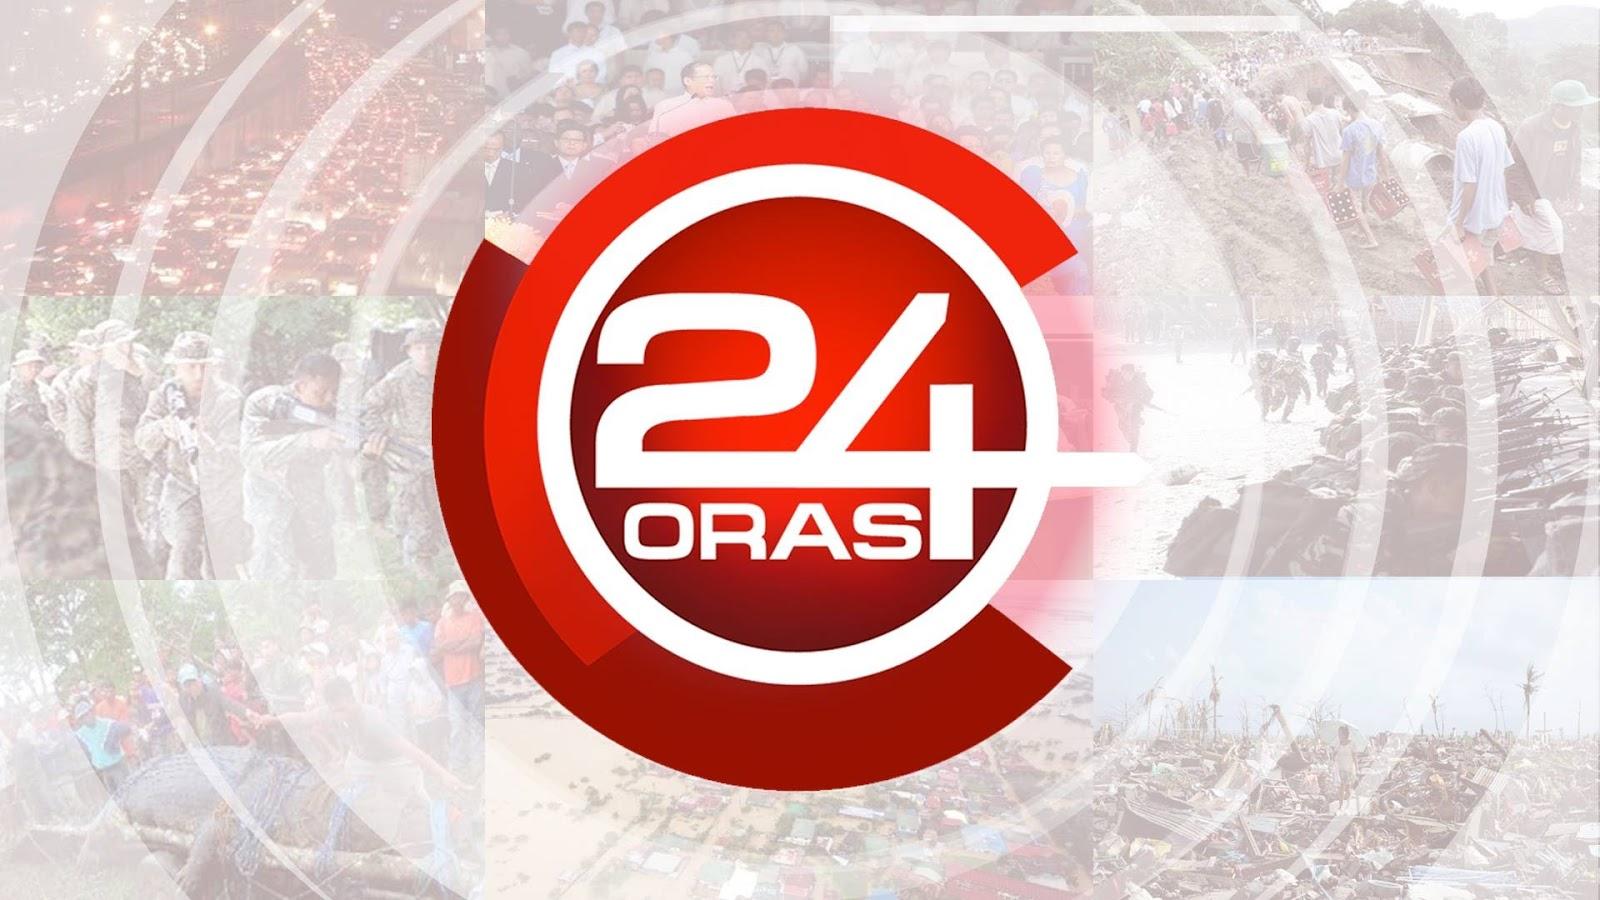 24 Oras November 30 2017